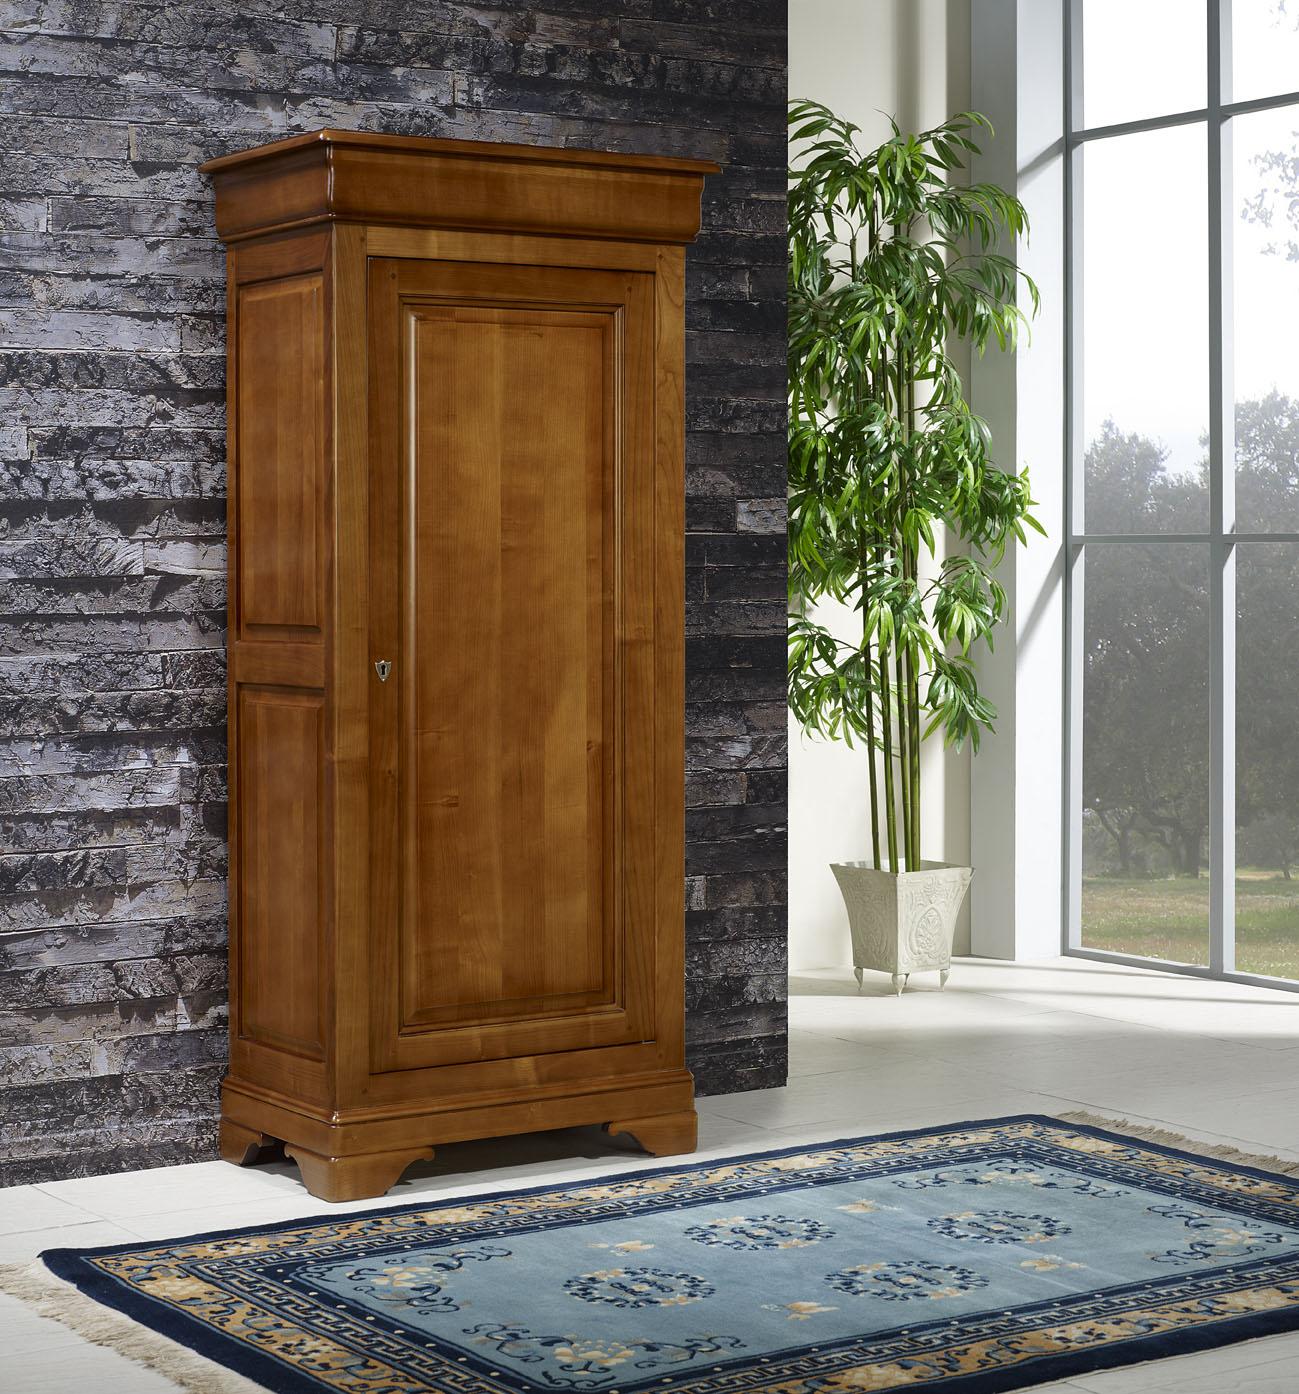 Bonnetière en Merisier Massif de style Louis Philippe , meuble en Merisier  massif